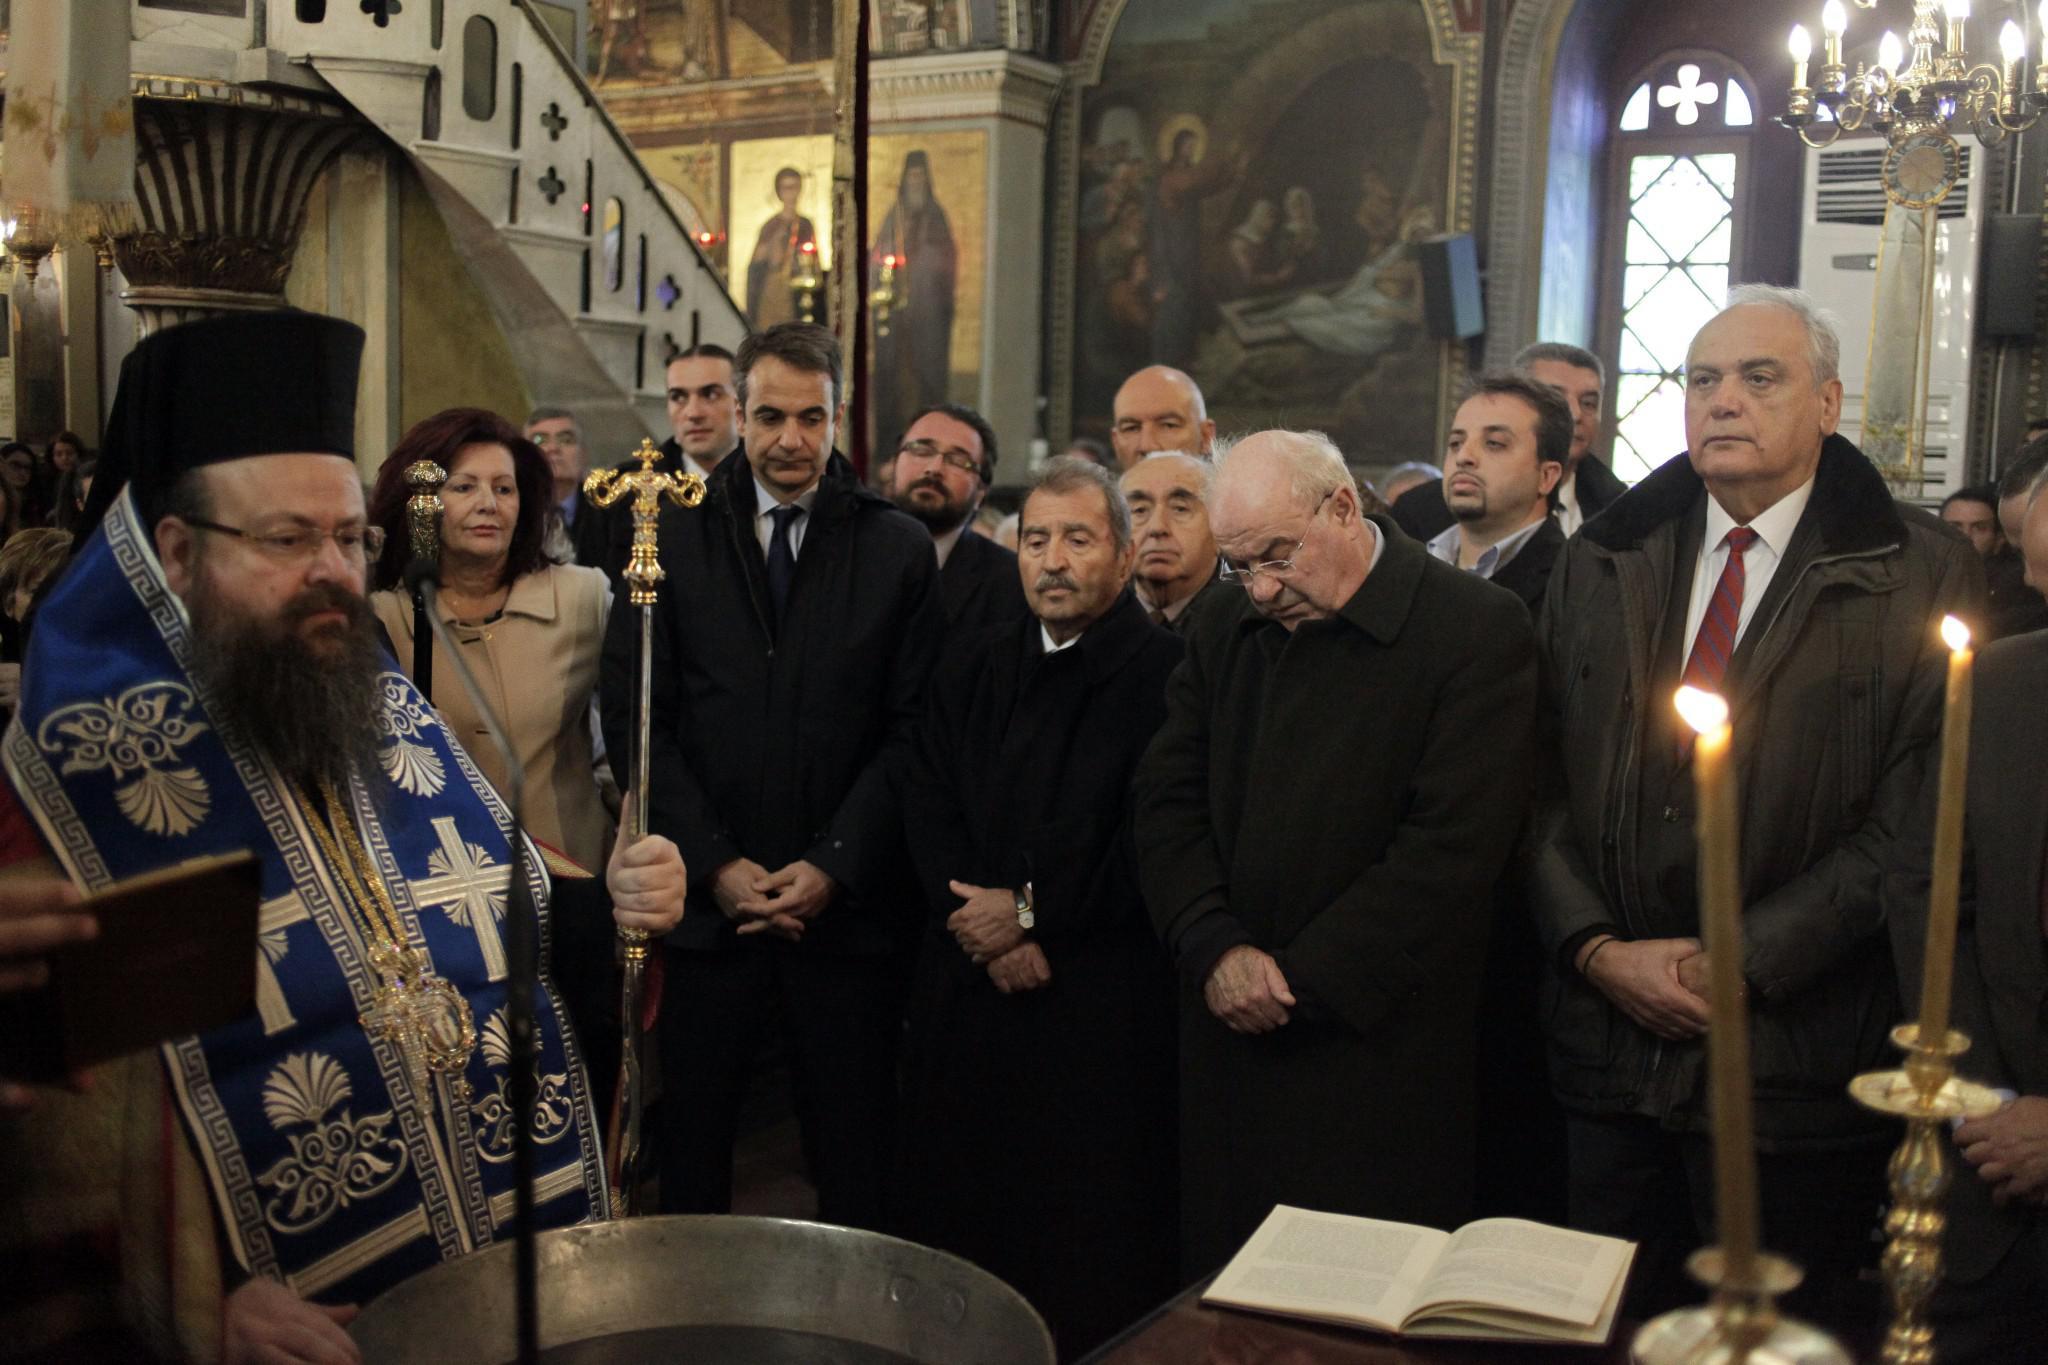 mitsotakis5-500 Μητσοτάκης: Είναι άμεση η ανάγκη για ενότητα [εικόνες]